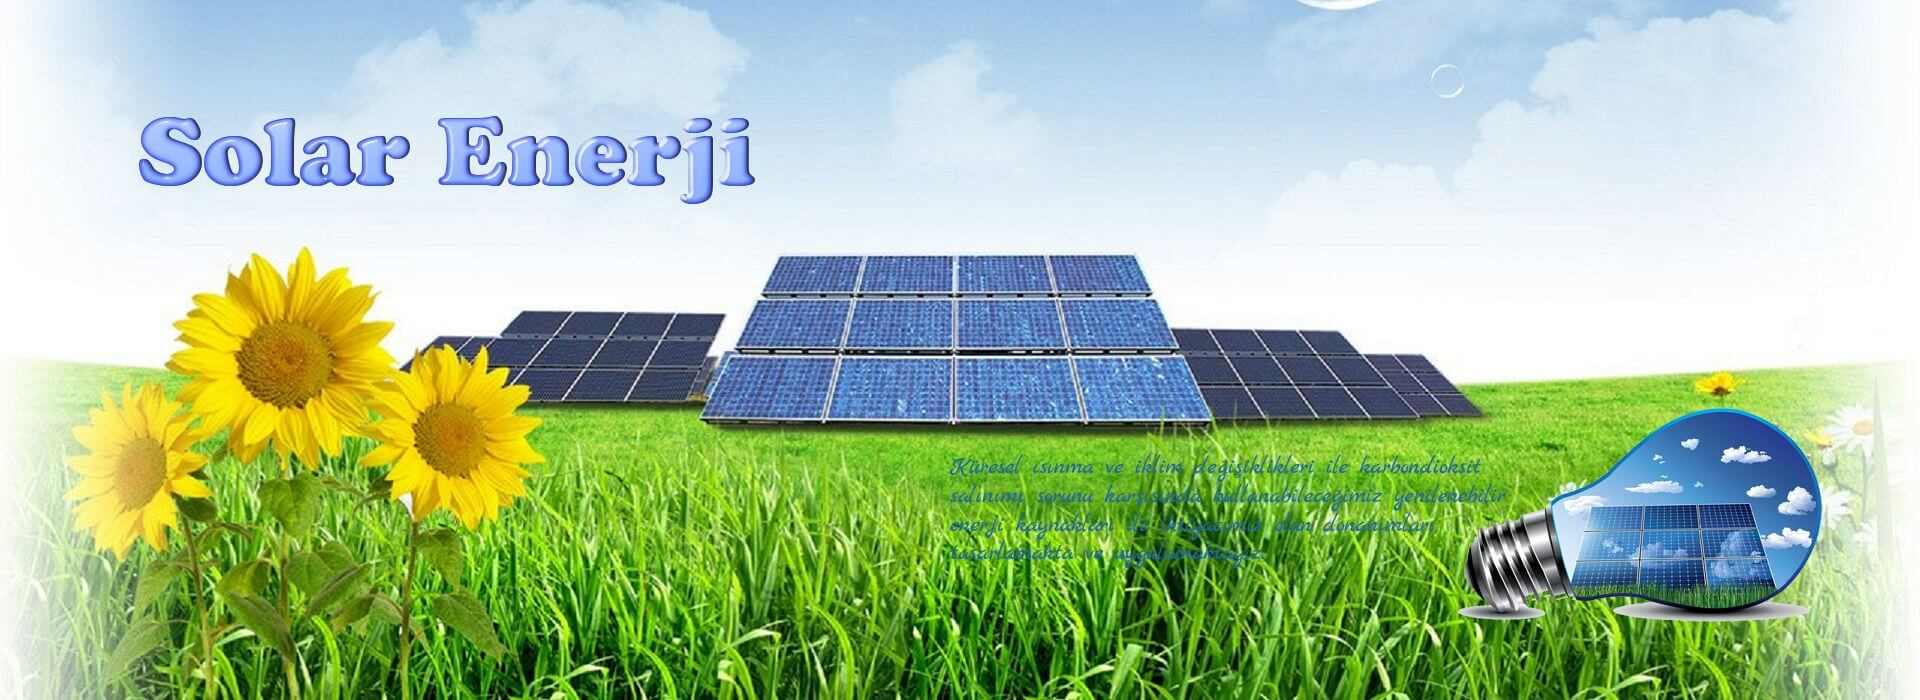 Solar Enerji